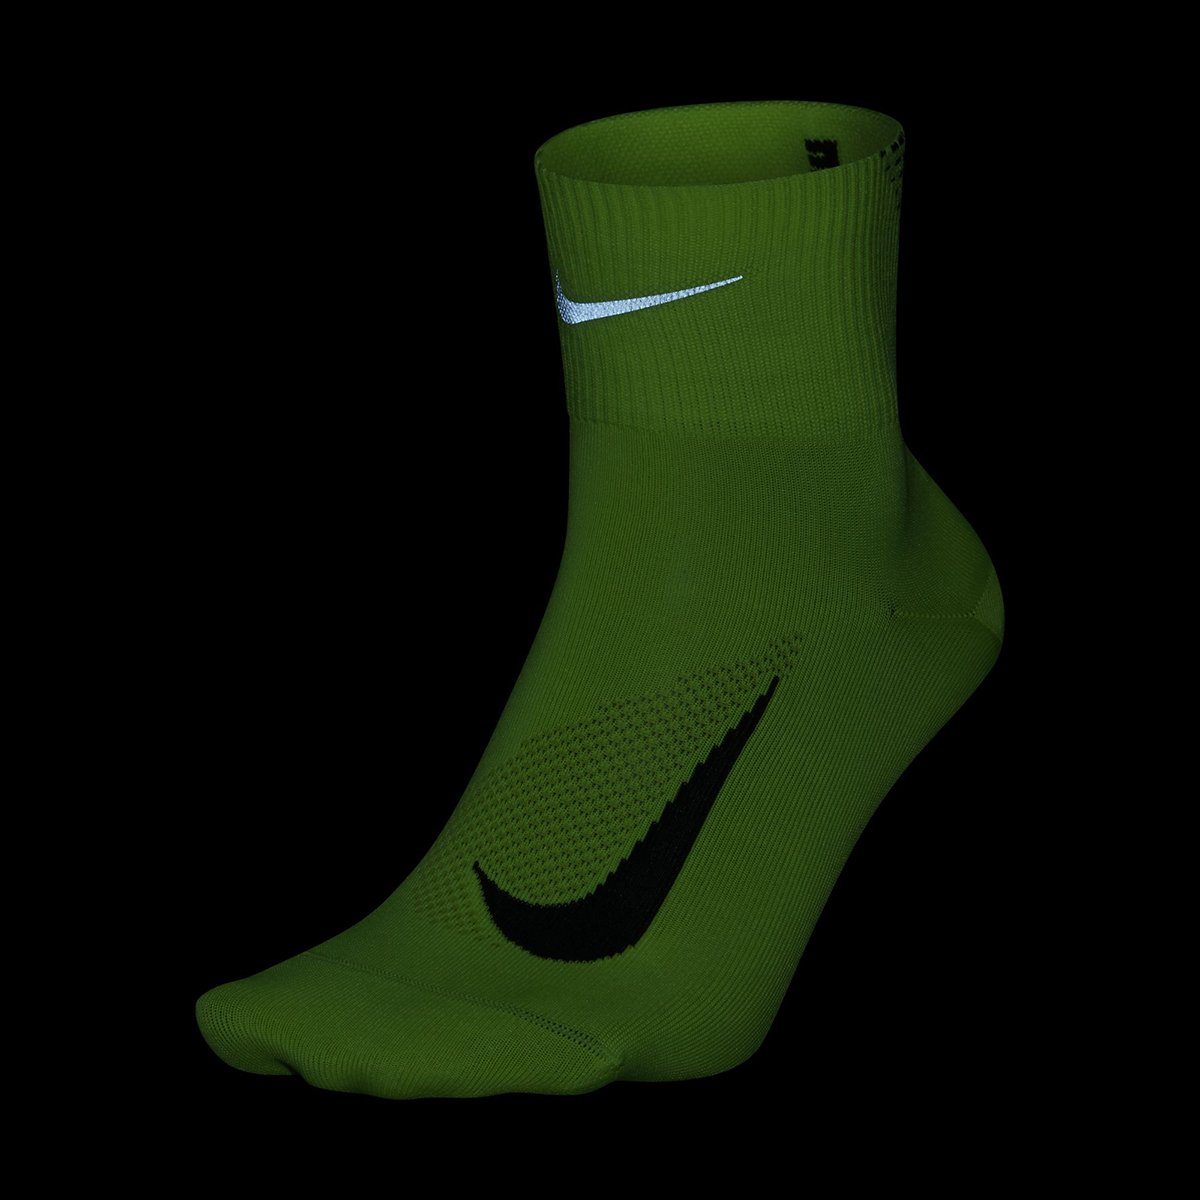 b5734faa48 Meia Nike Elite Running Lightweight 2.0 - Compre Agora